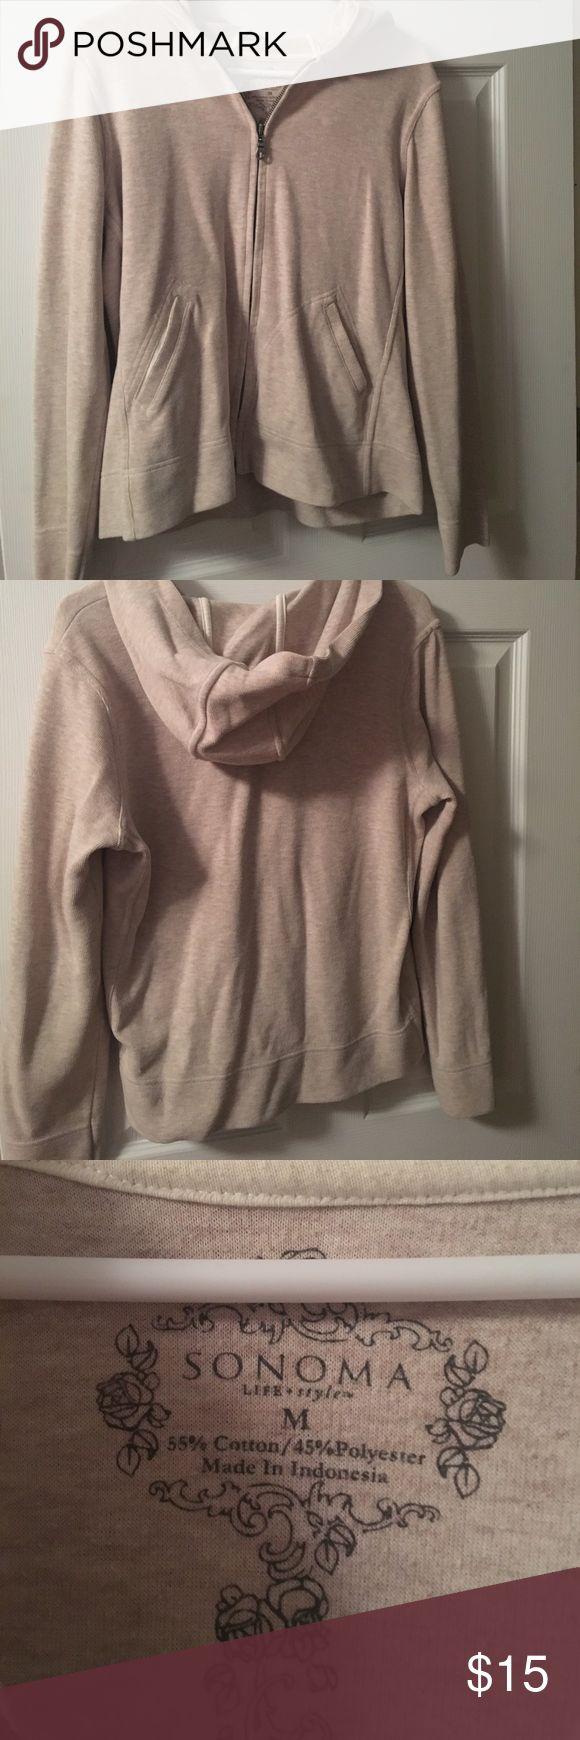 Sonoma cream/beige zip up hoodie Sonoma cream/beige zip up hoodie, with sleeves, cotton and polyester, size M Sonoma Tops Sweatshirts & Hoodies